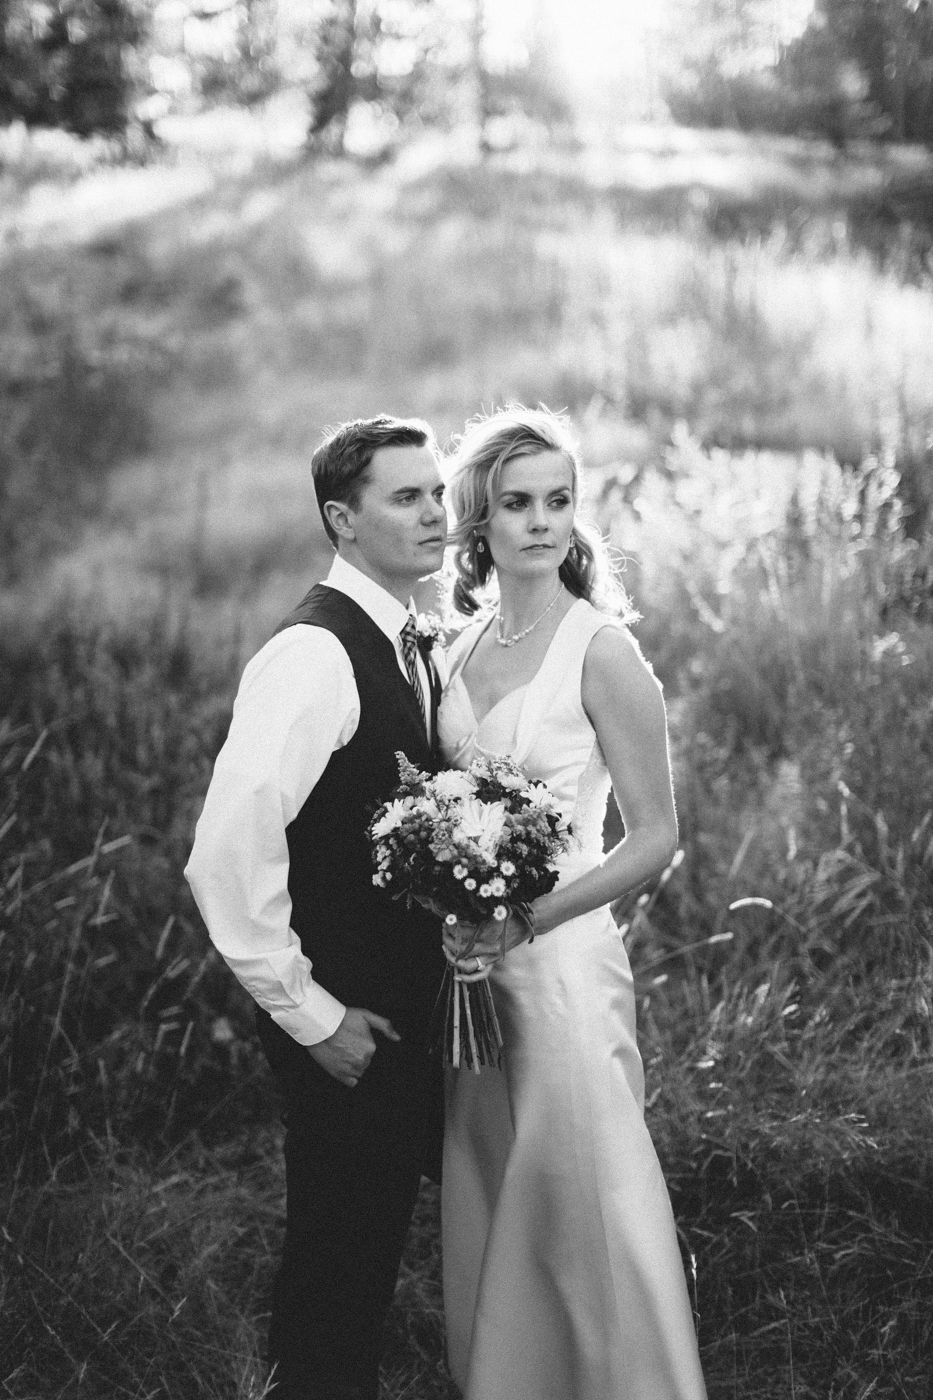 SouthDakota-Iowa-Destination-Wedding-Photographer_106.jpg